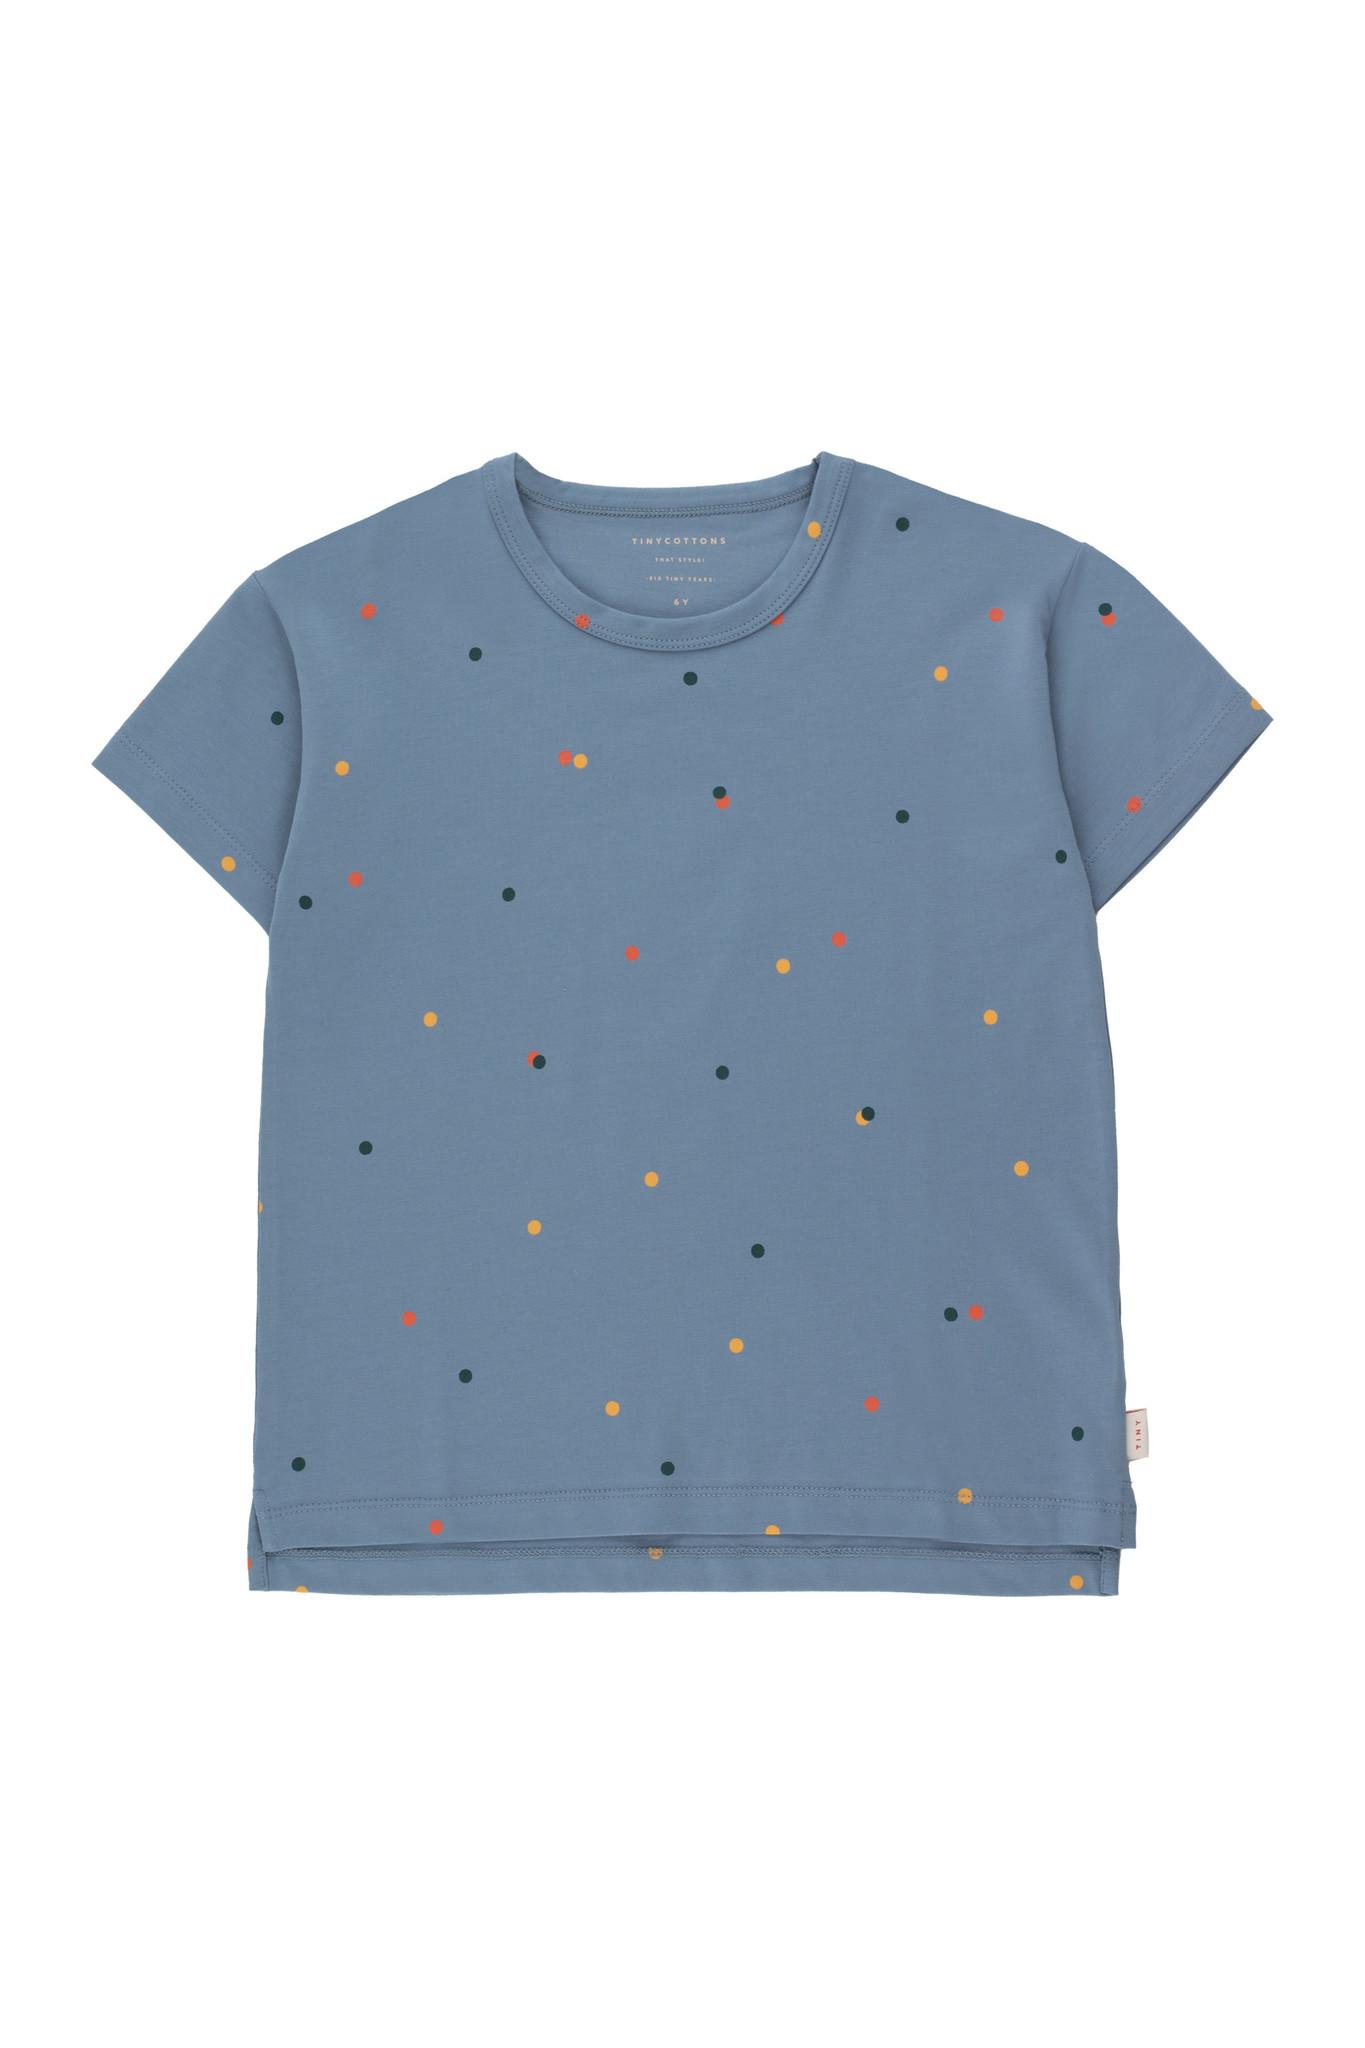 Ice cream dots tee - Grey Blue-1